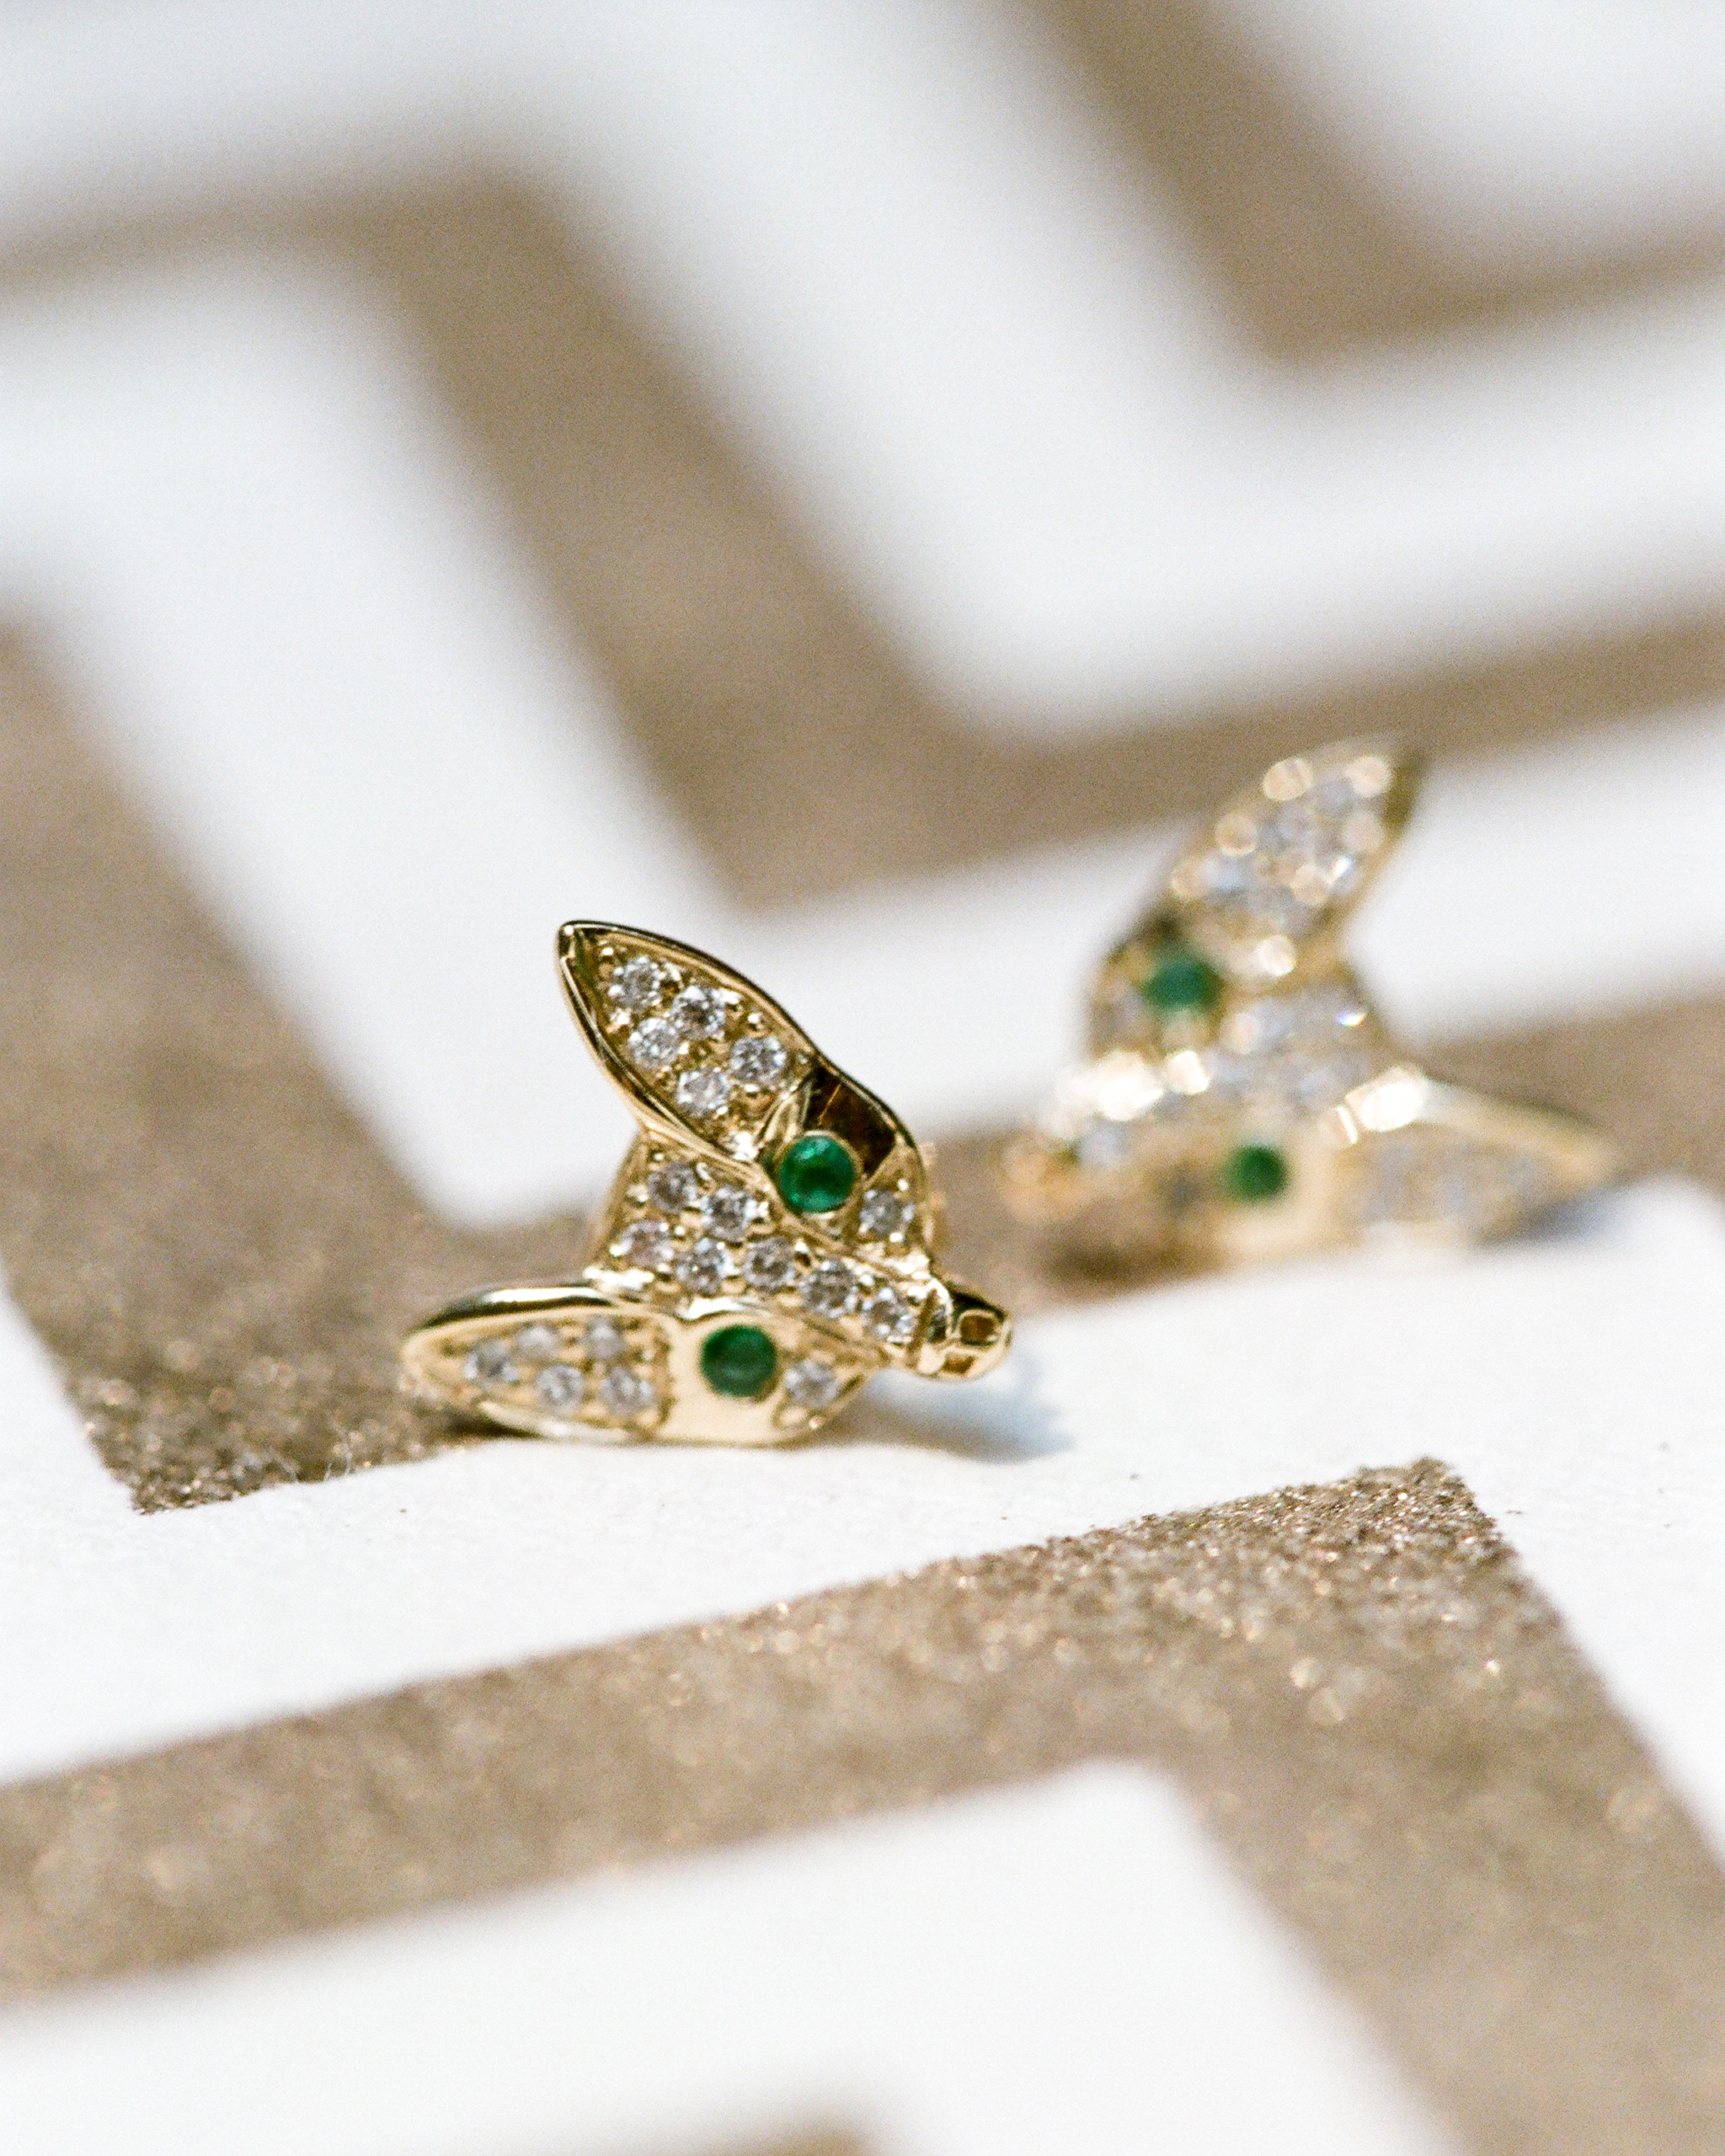 amy-bob-wedding-cufflinks-0108-s111884-0715.jpg